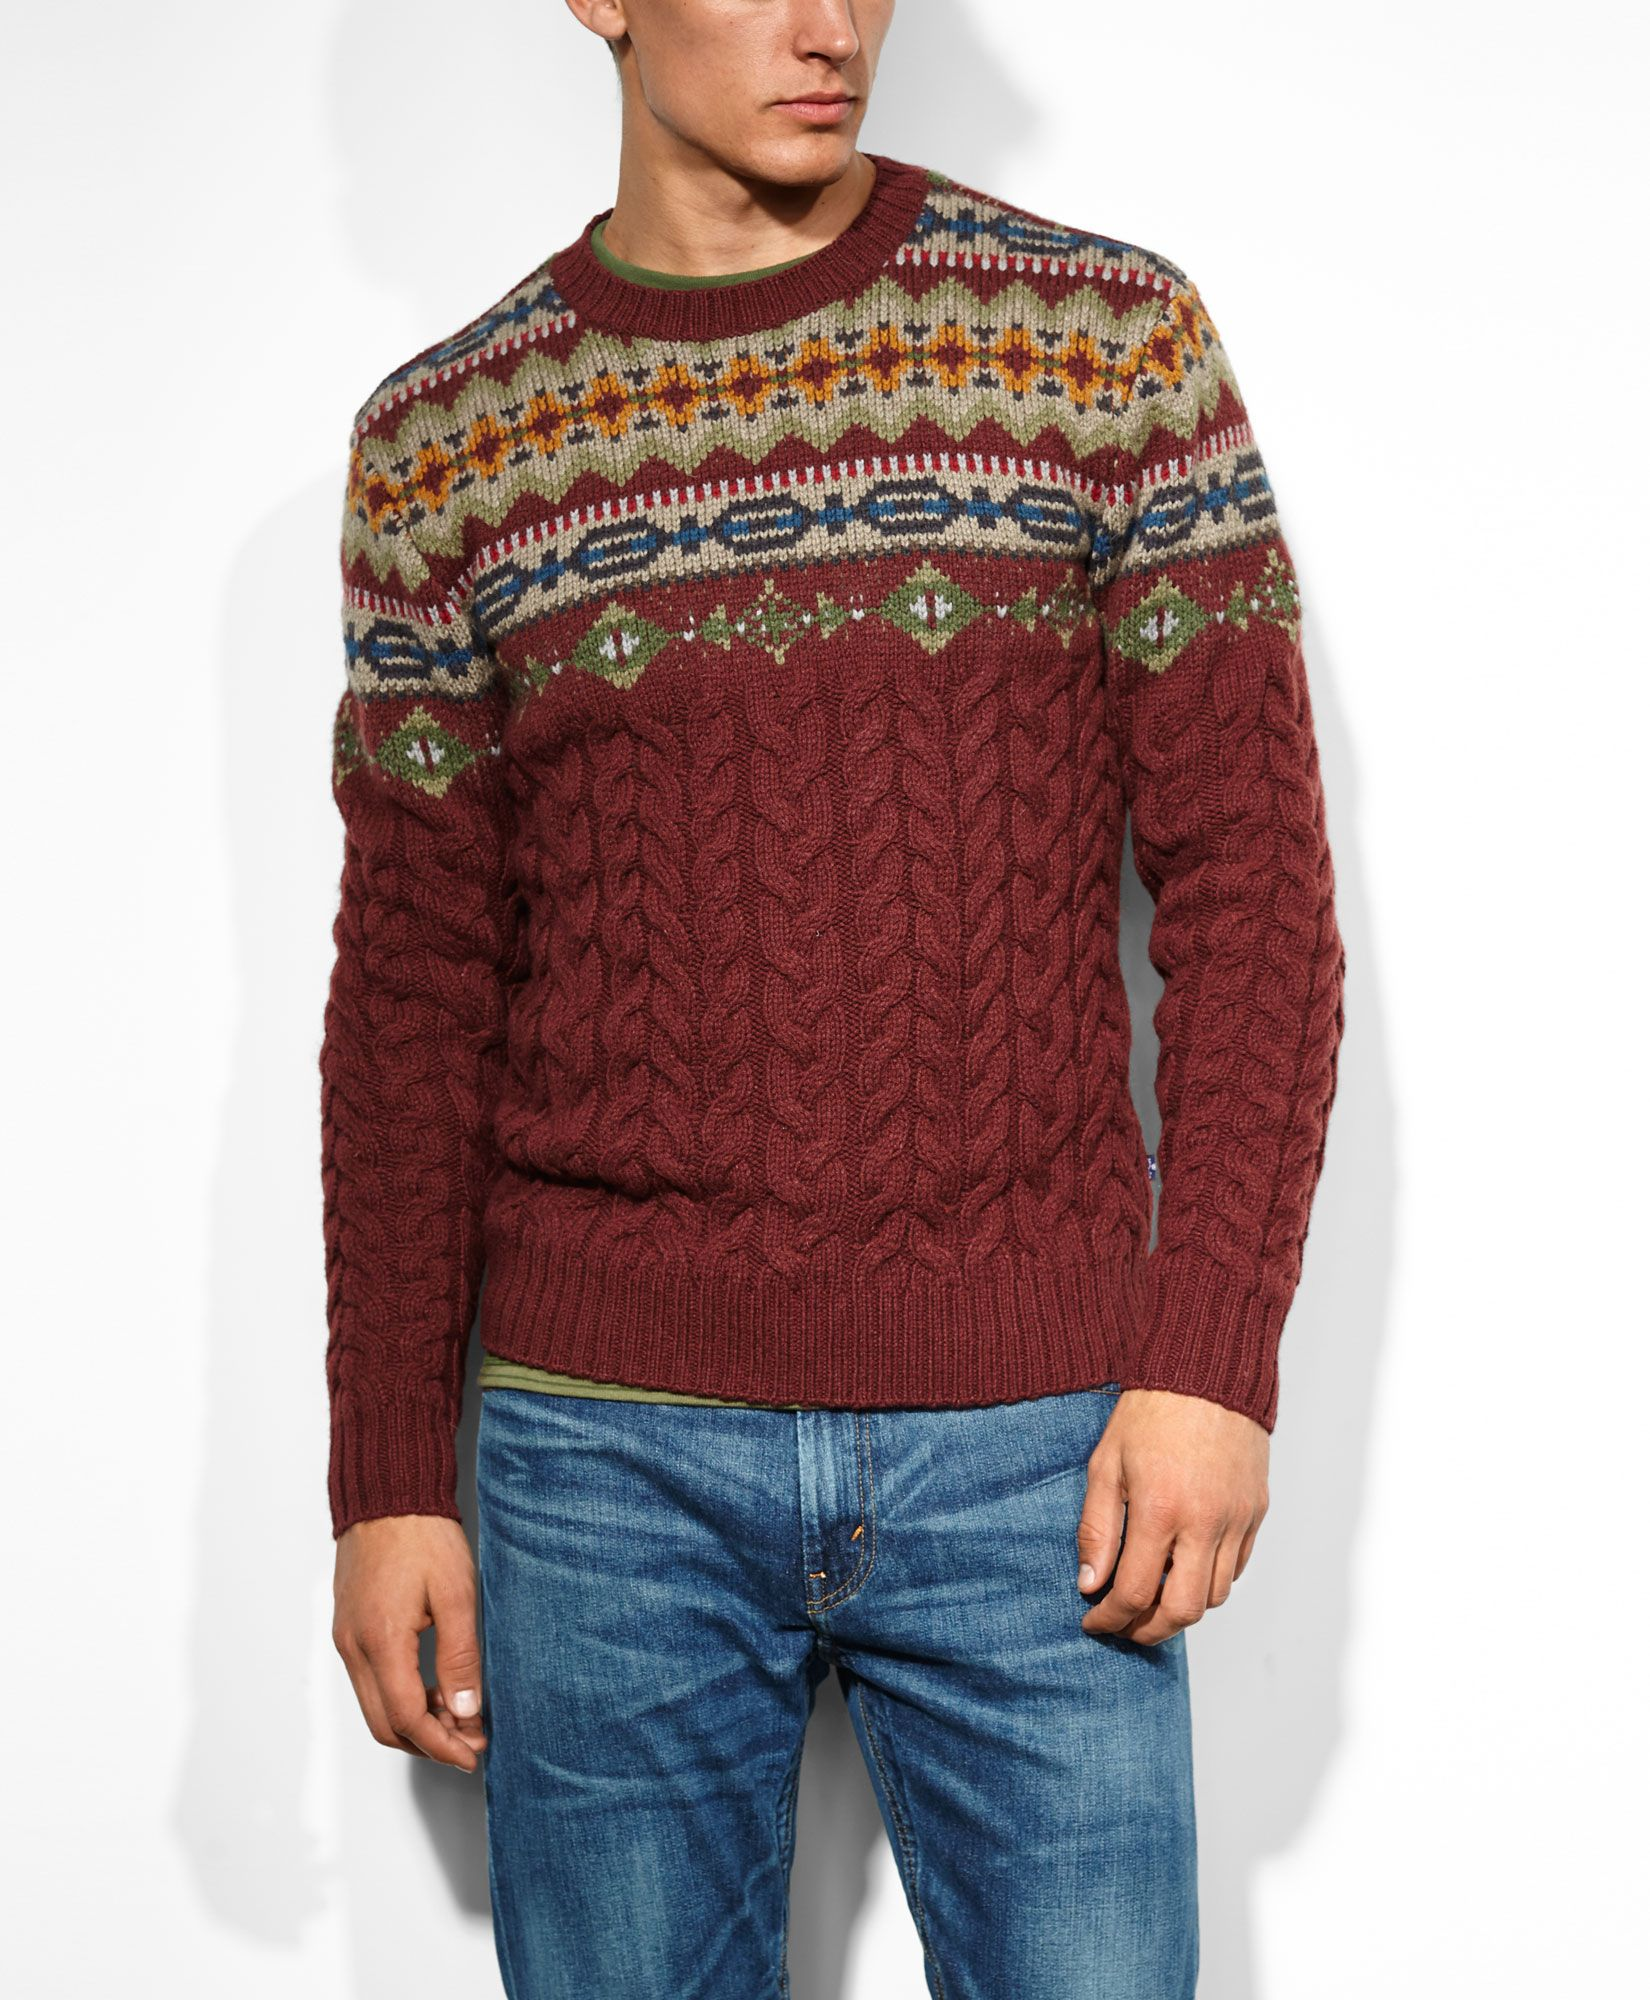 Levi's Fair Isle Textured Sweater - Rum Raisin - Sweatshirts ...